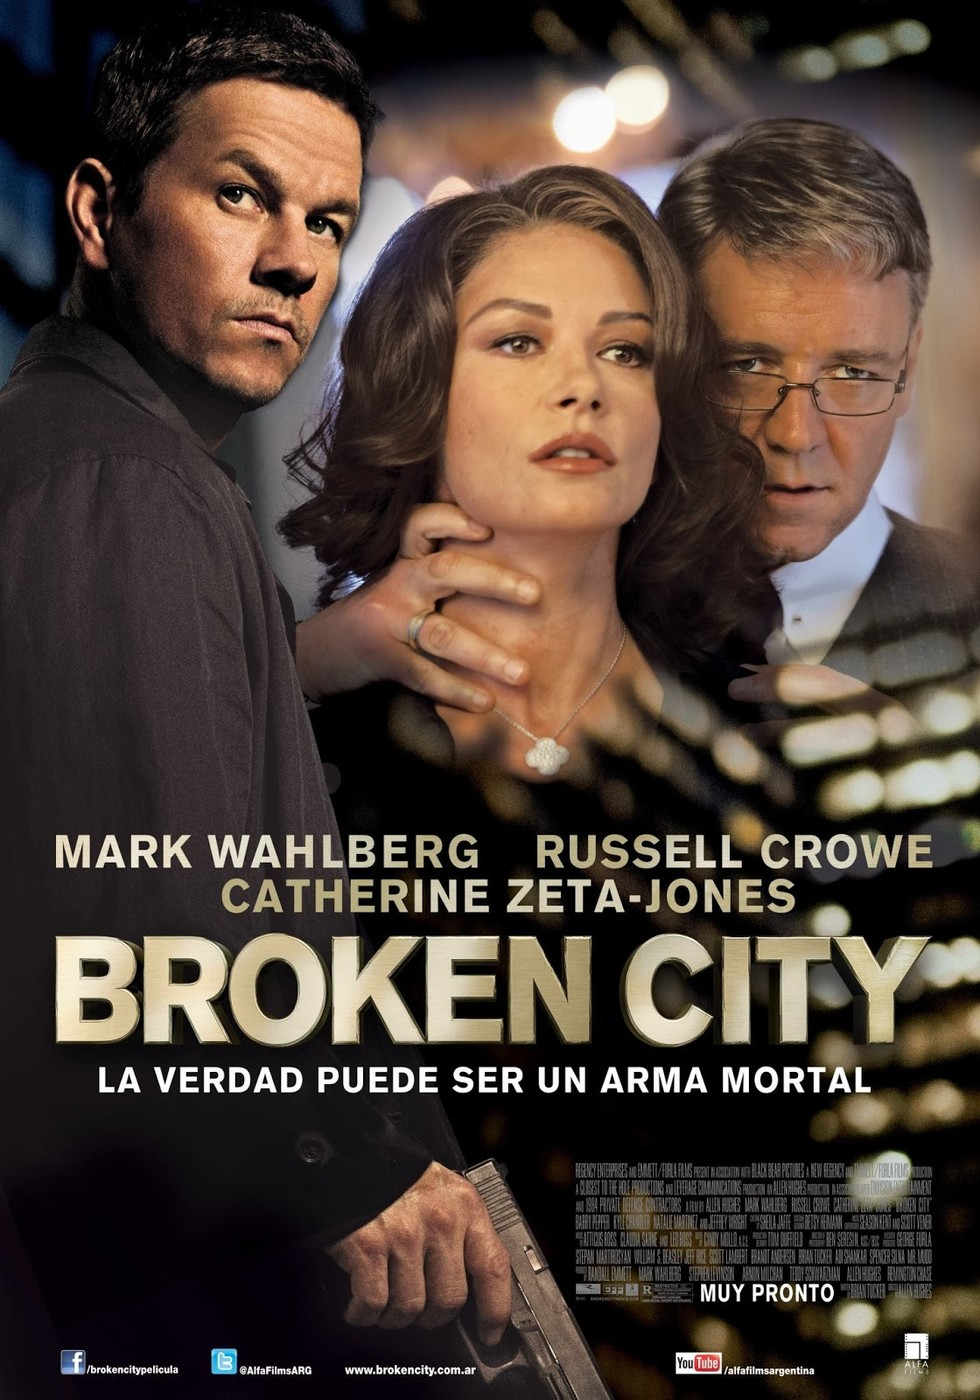 Broken City - Movie Poster #2 (Large)